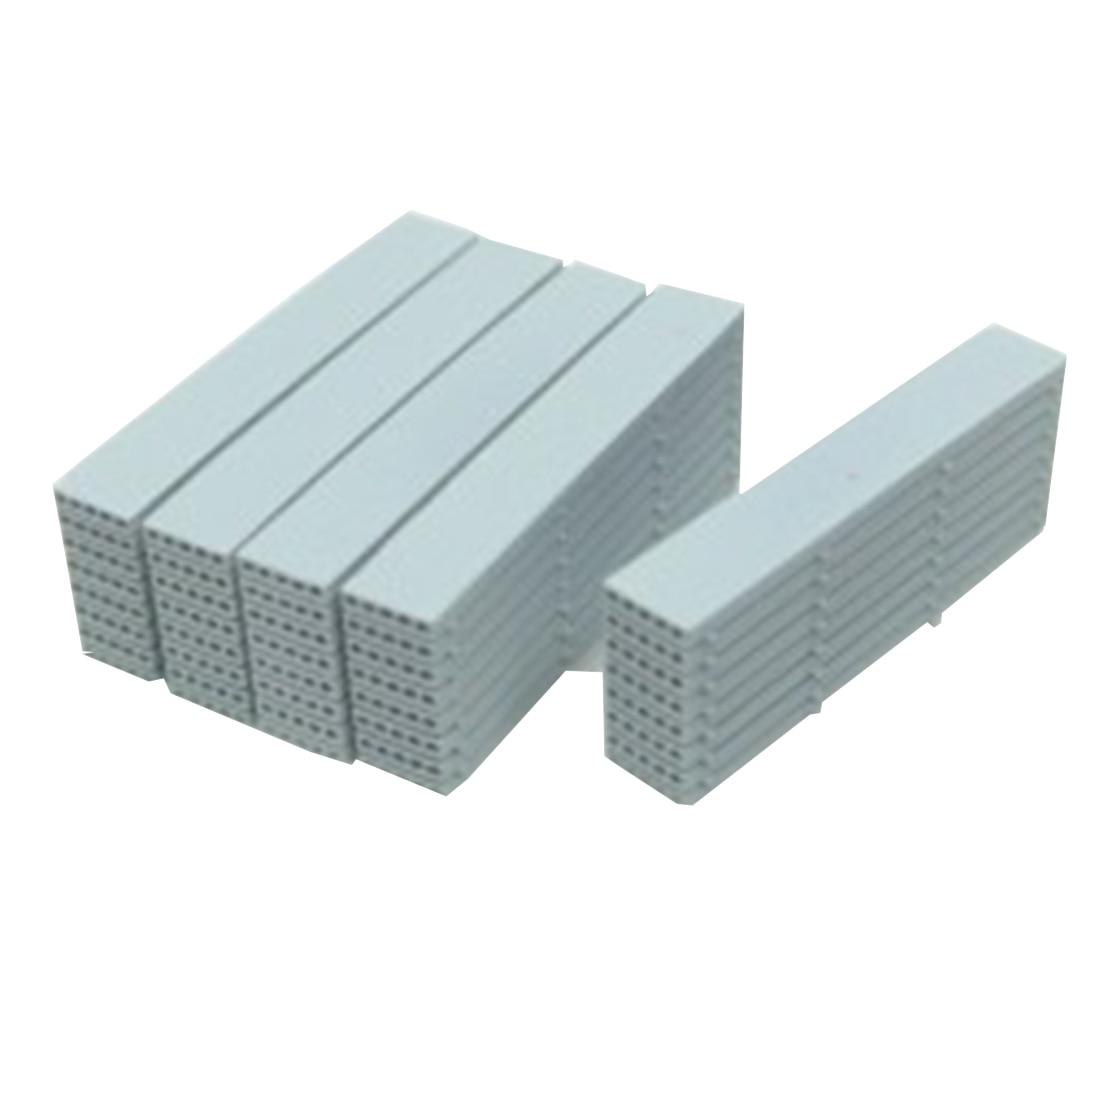 5Pcs/set 3.5cm 1:87 HO Scale Train Model Station Prefabricated Panels Sand Table Simulation Prefabricated Panels - Short